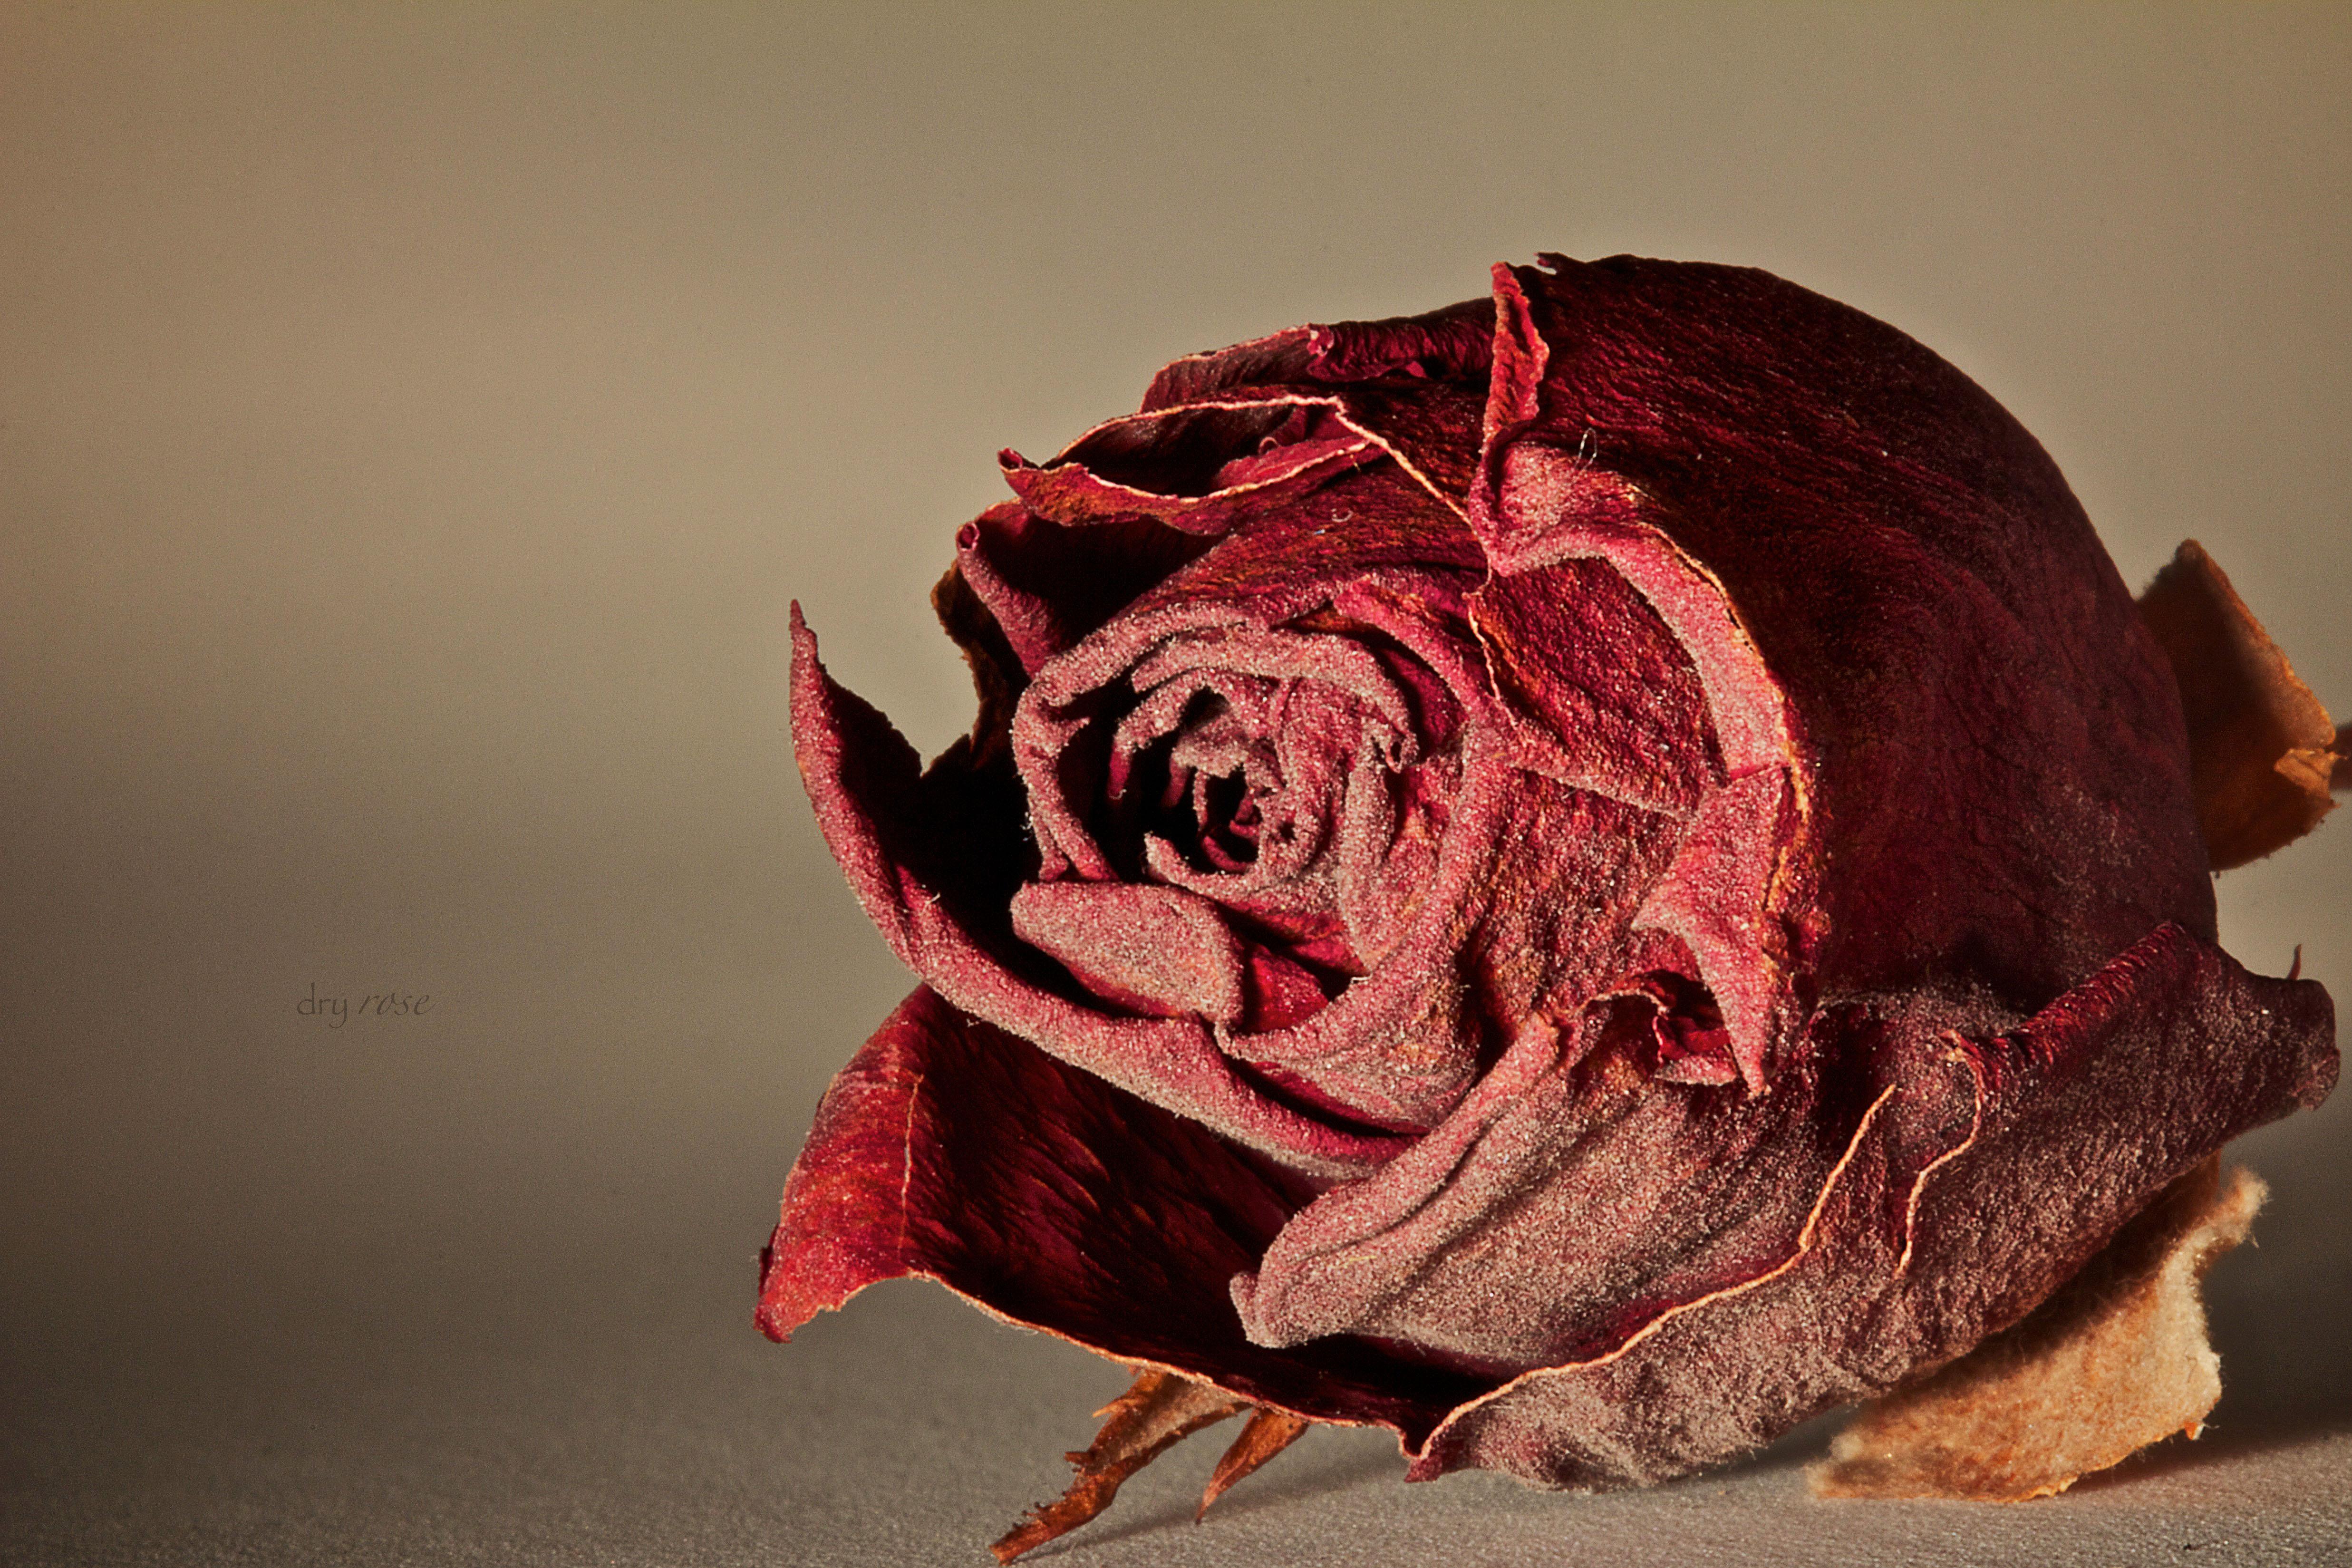 dry-rose1